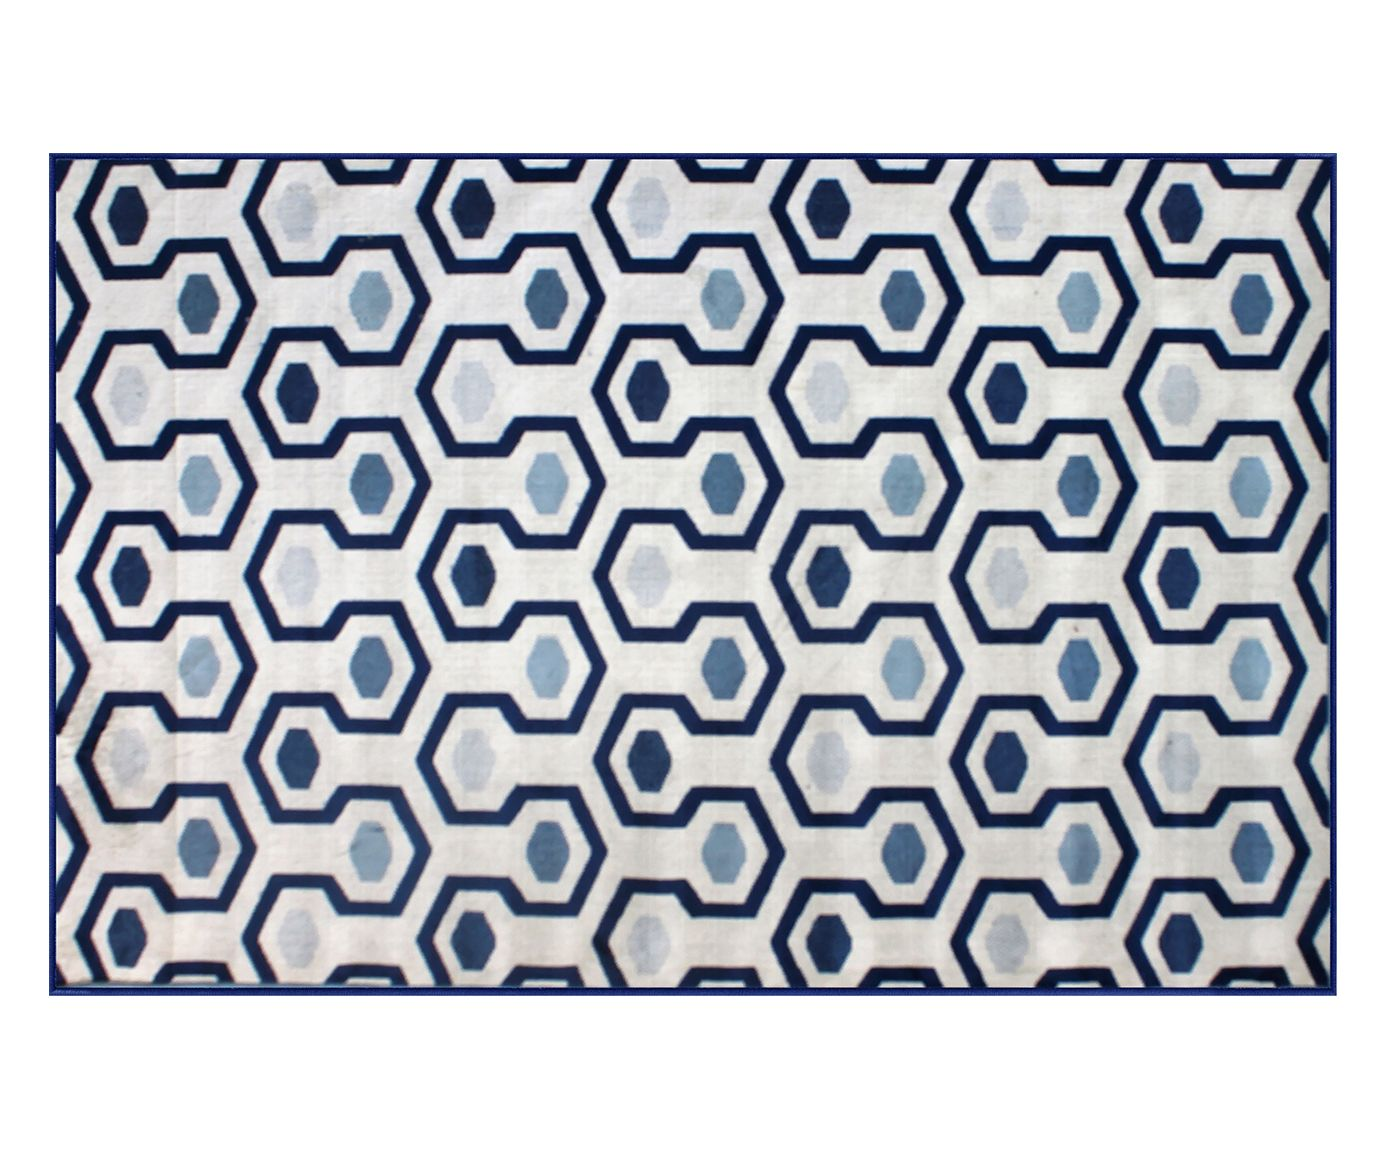 Tapete Belga Star Donnie Azul - 140X200cm | Westwing.com.br